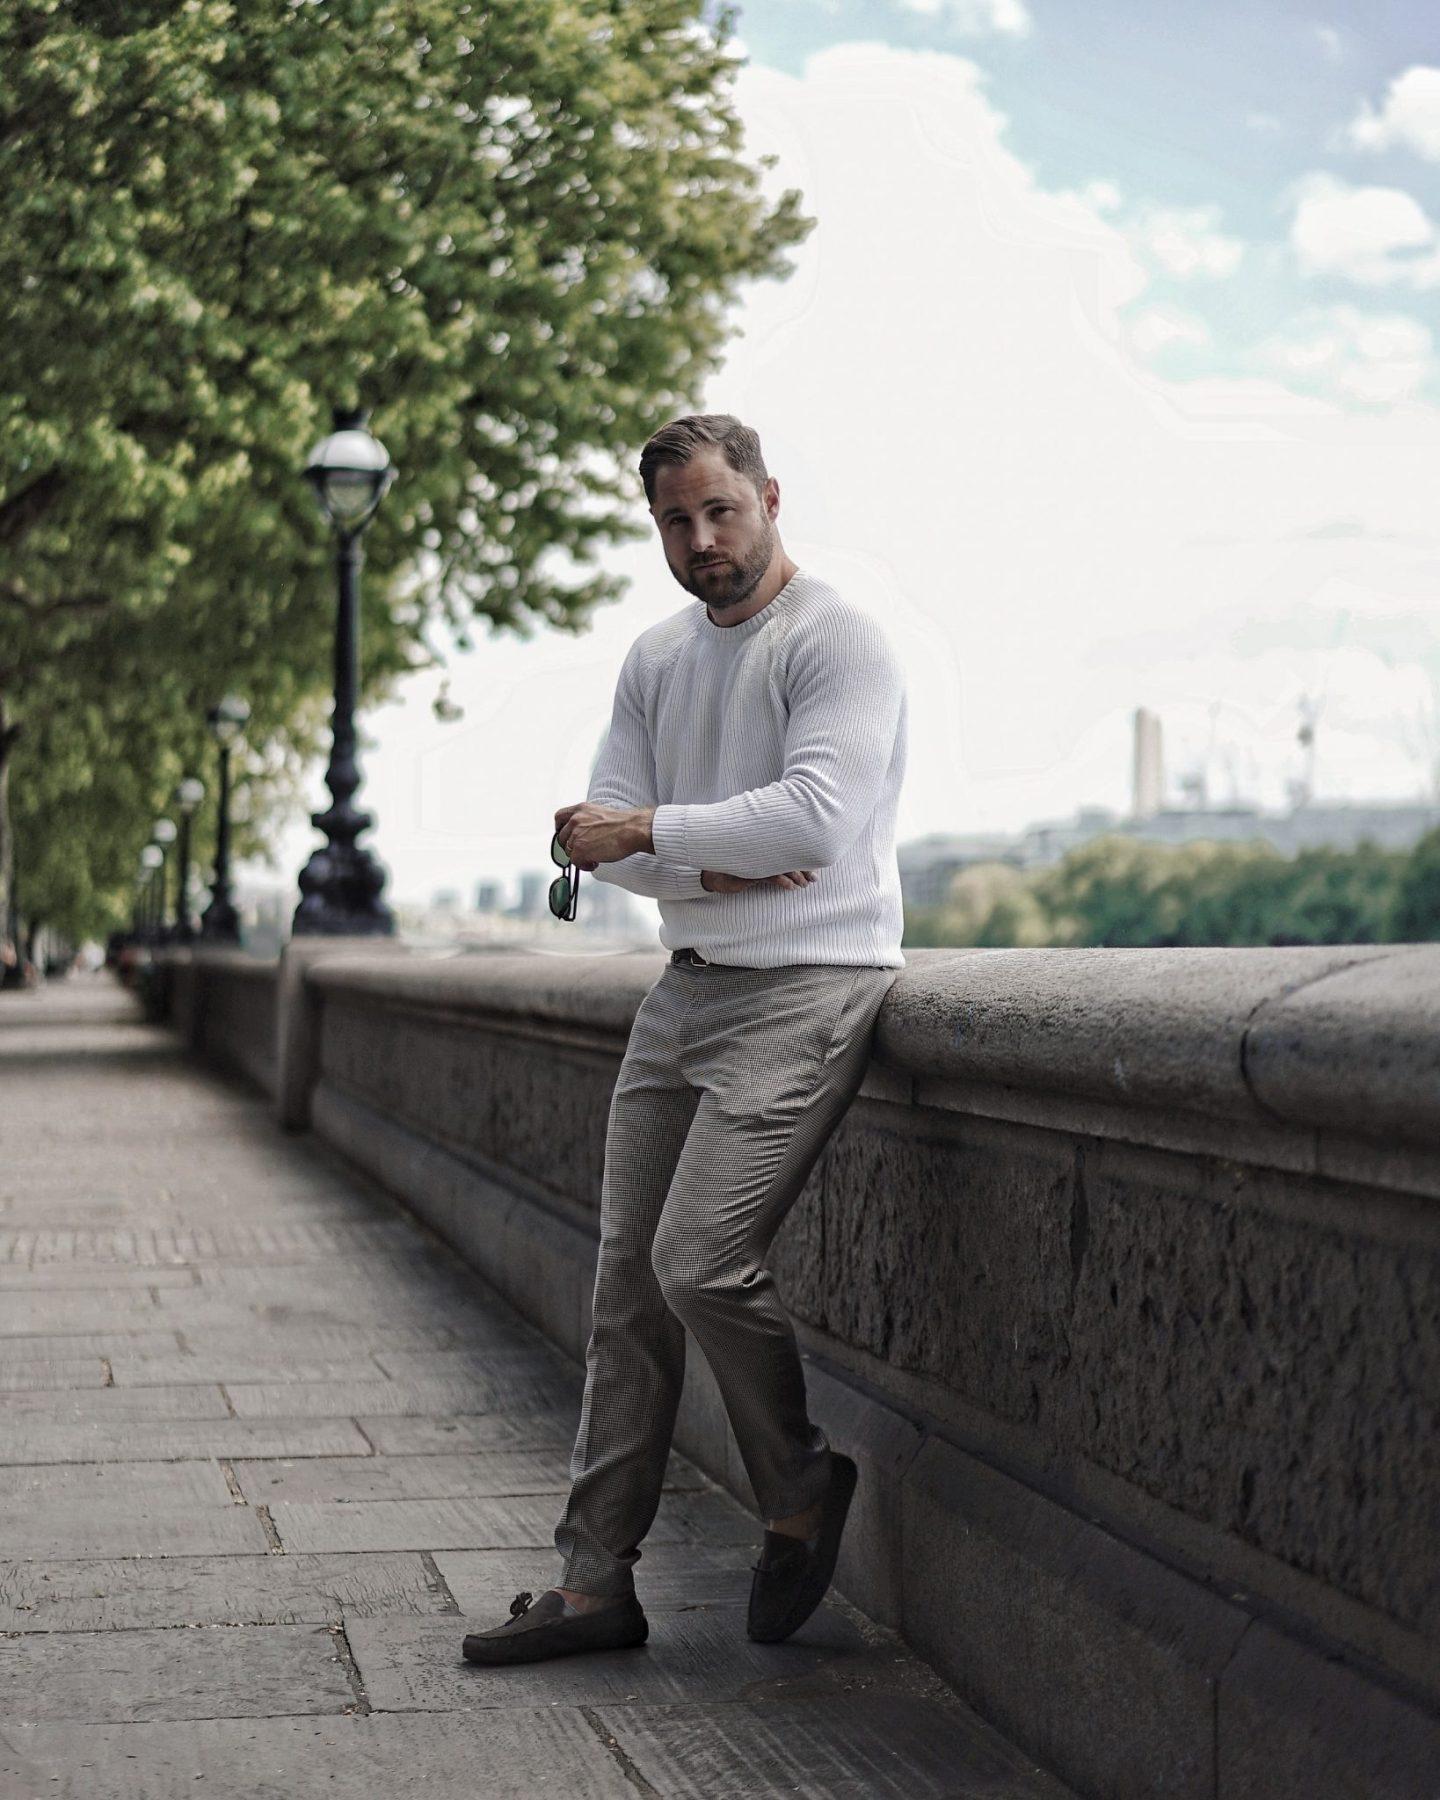 Zara White Sweater and Check Trousers Primark Menswear Spring Fashion